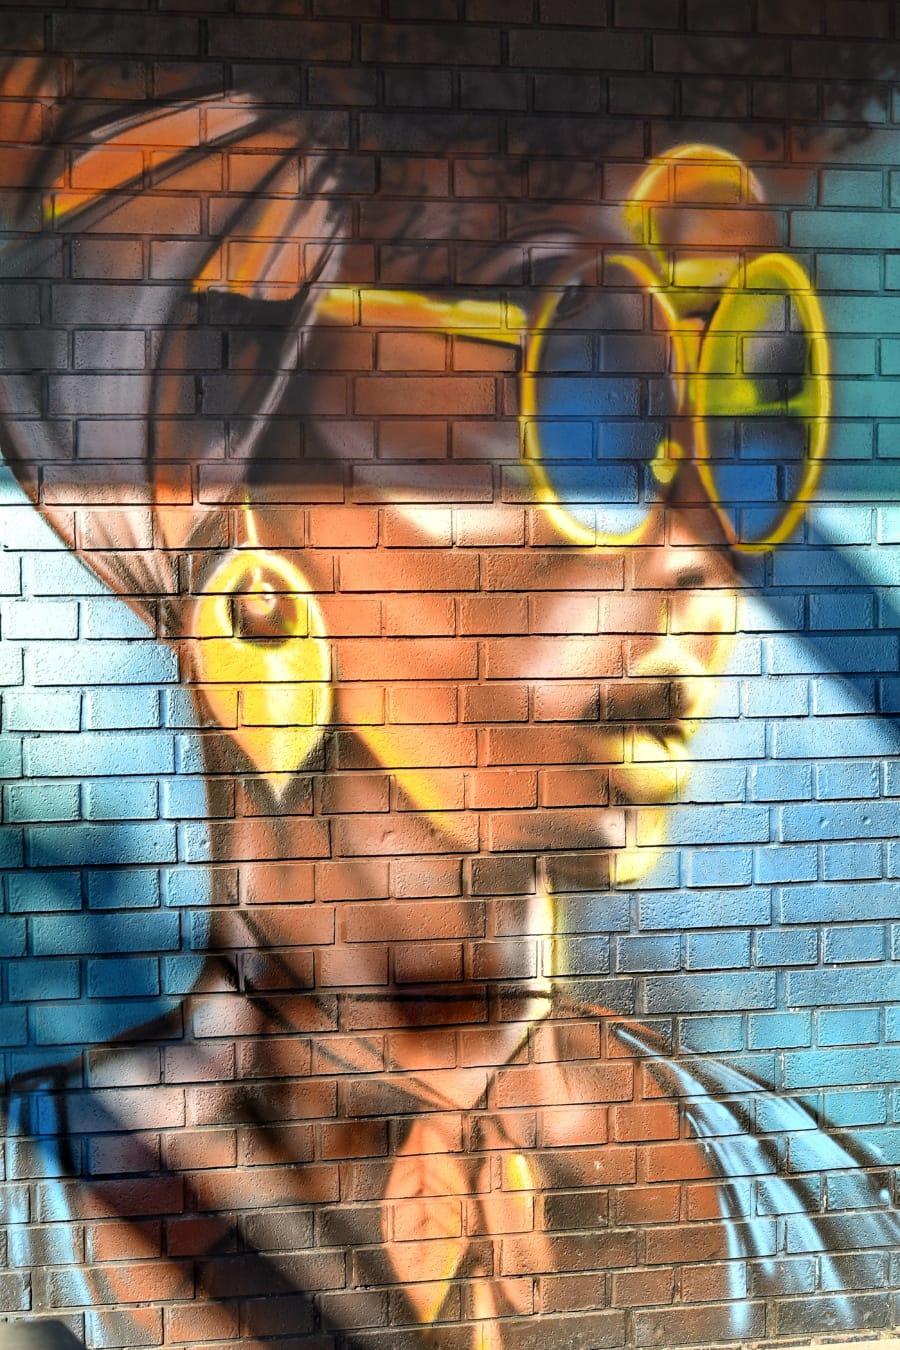 graffiti, bricks, young woman, wall, abstract, design, pattern, texture, art, color